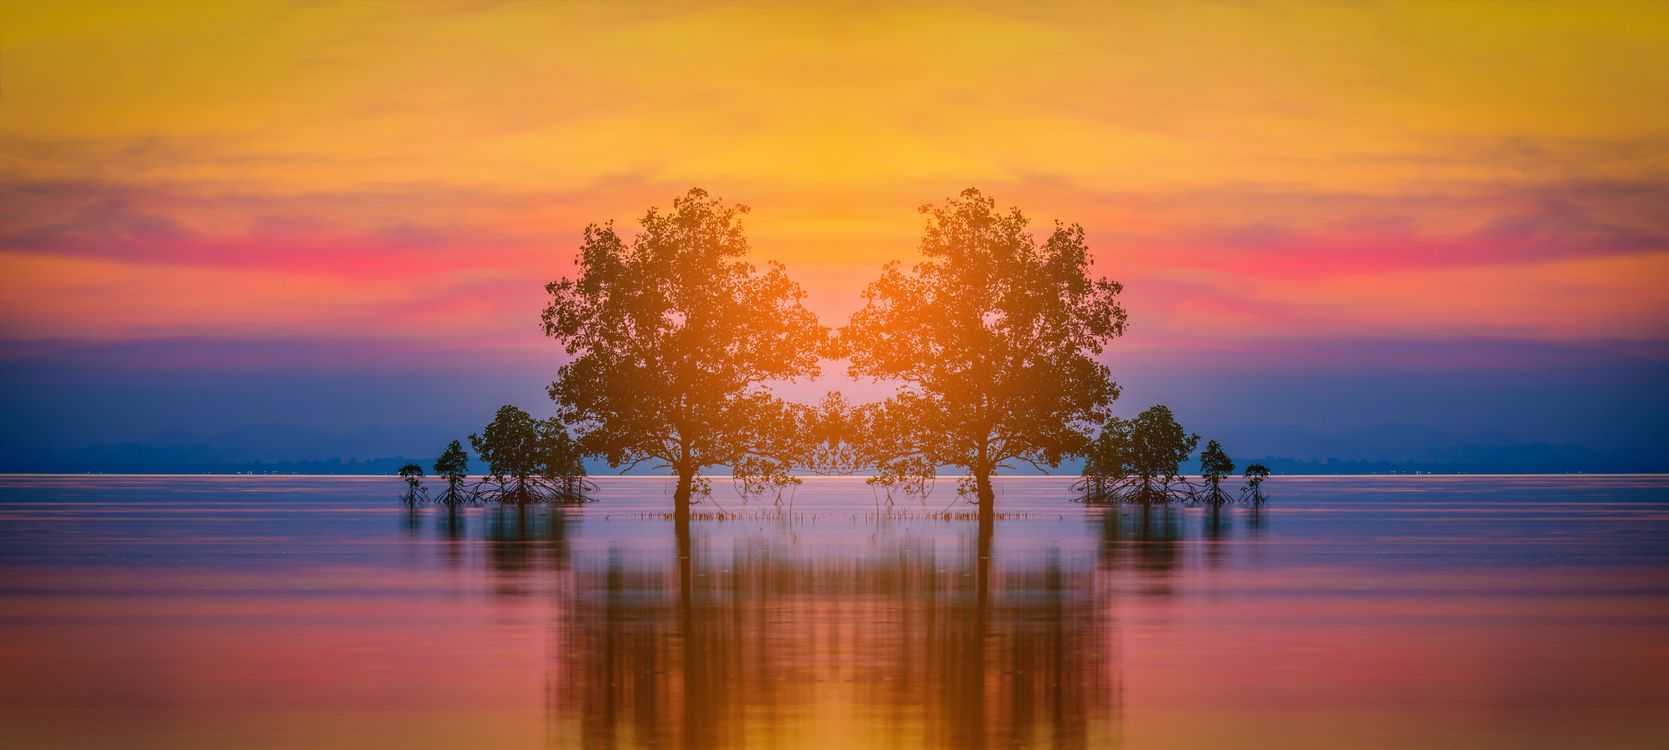 Фото бесплатно Силуэт дерева, море, закат - на рабочий стол